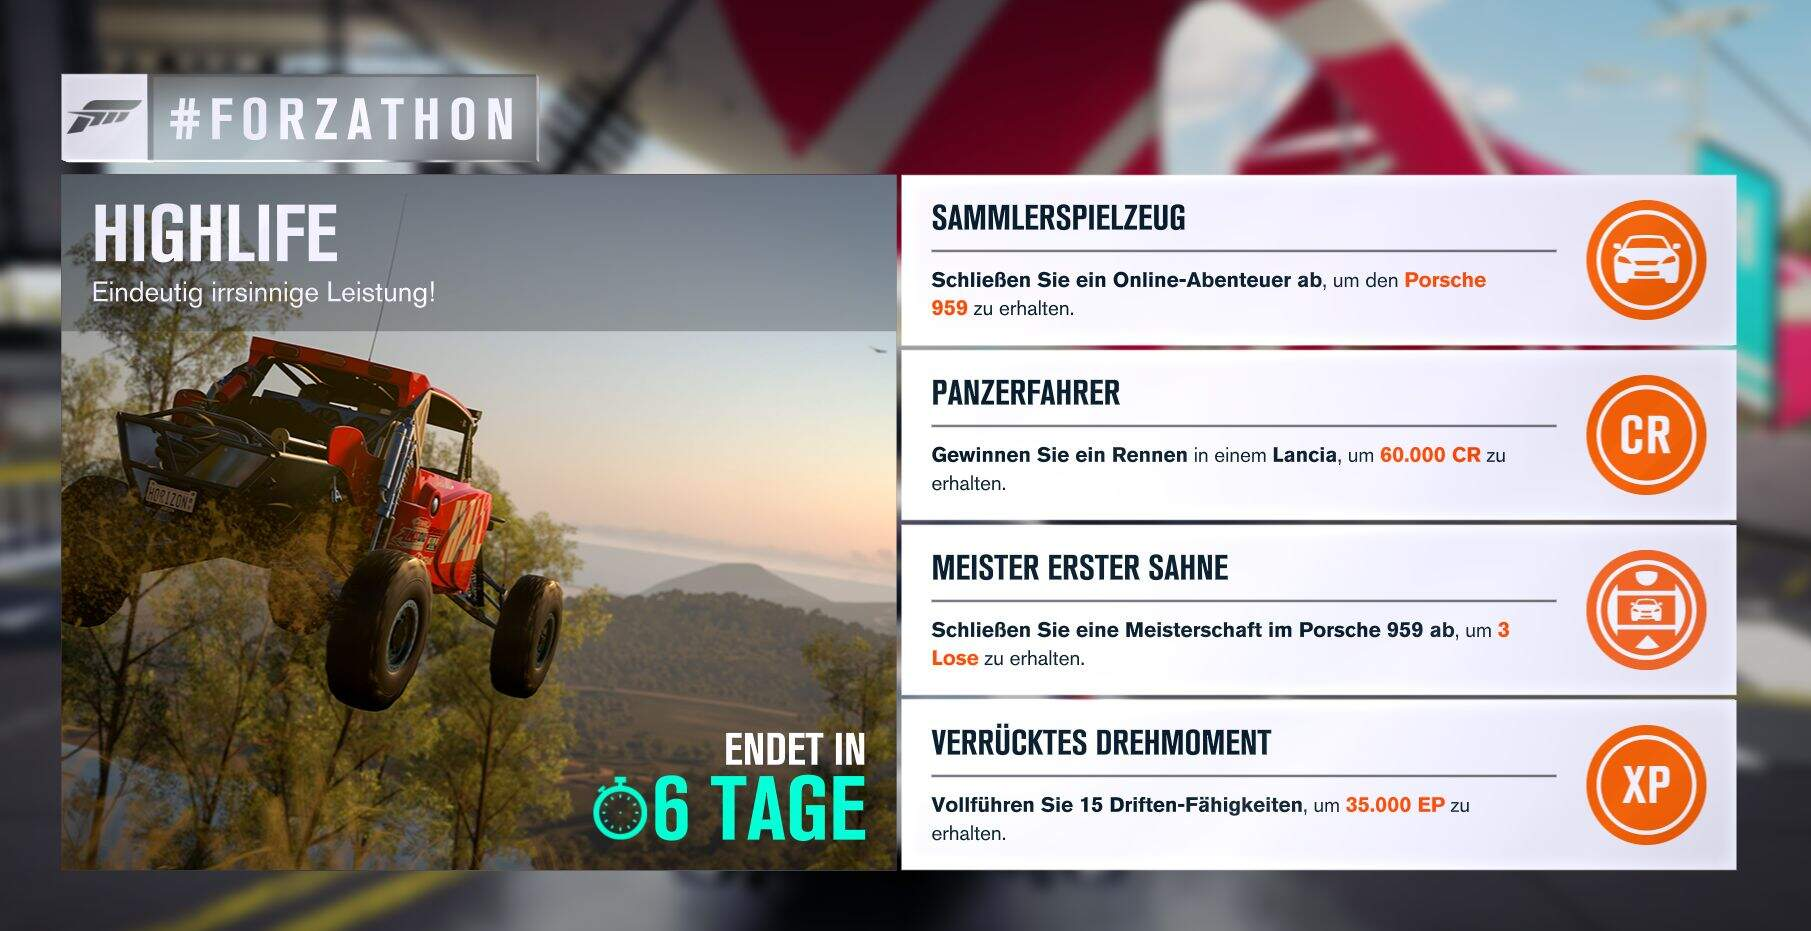 Forza Horizon 3 #Forzathon Guide KW 36 – Highlife